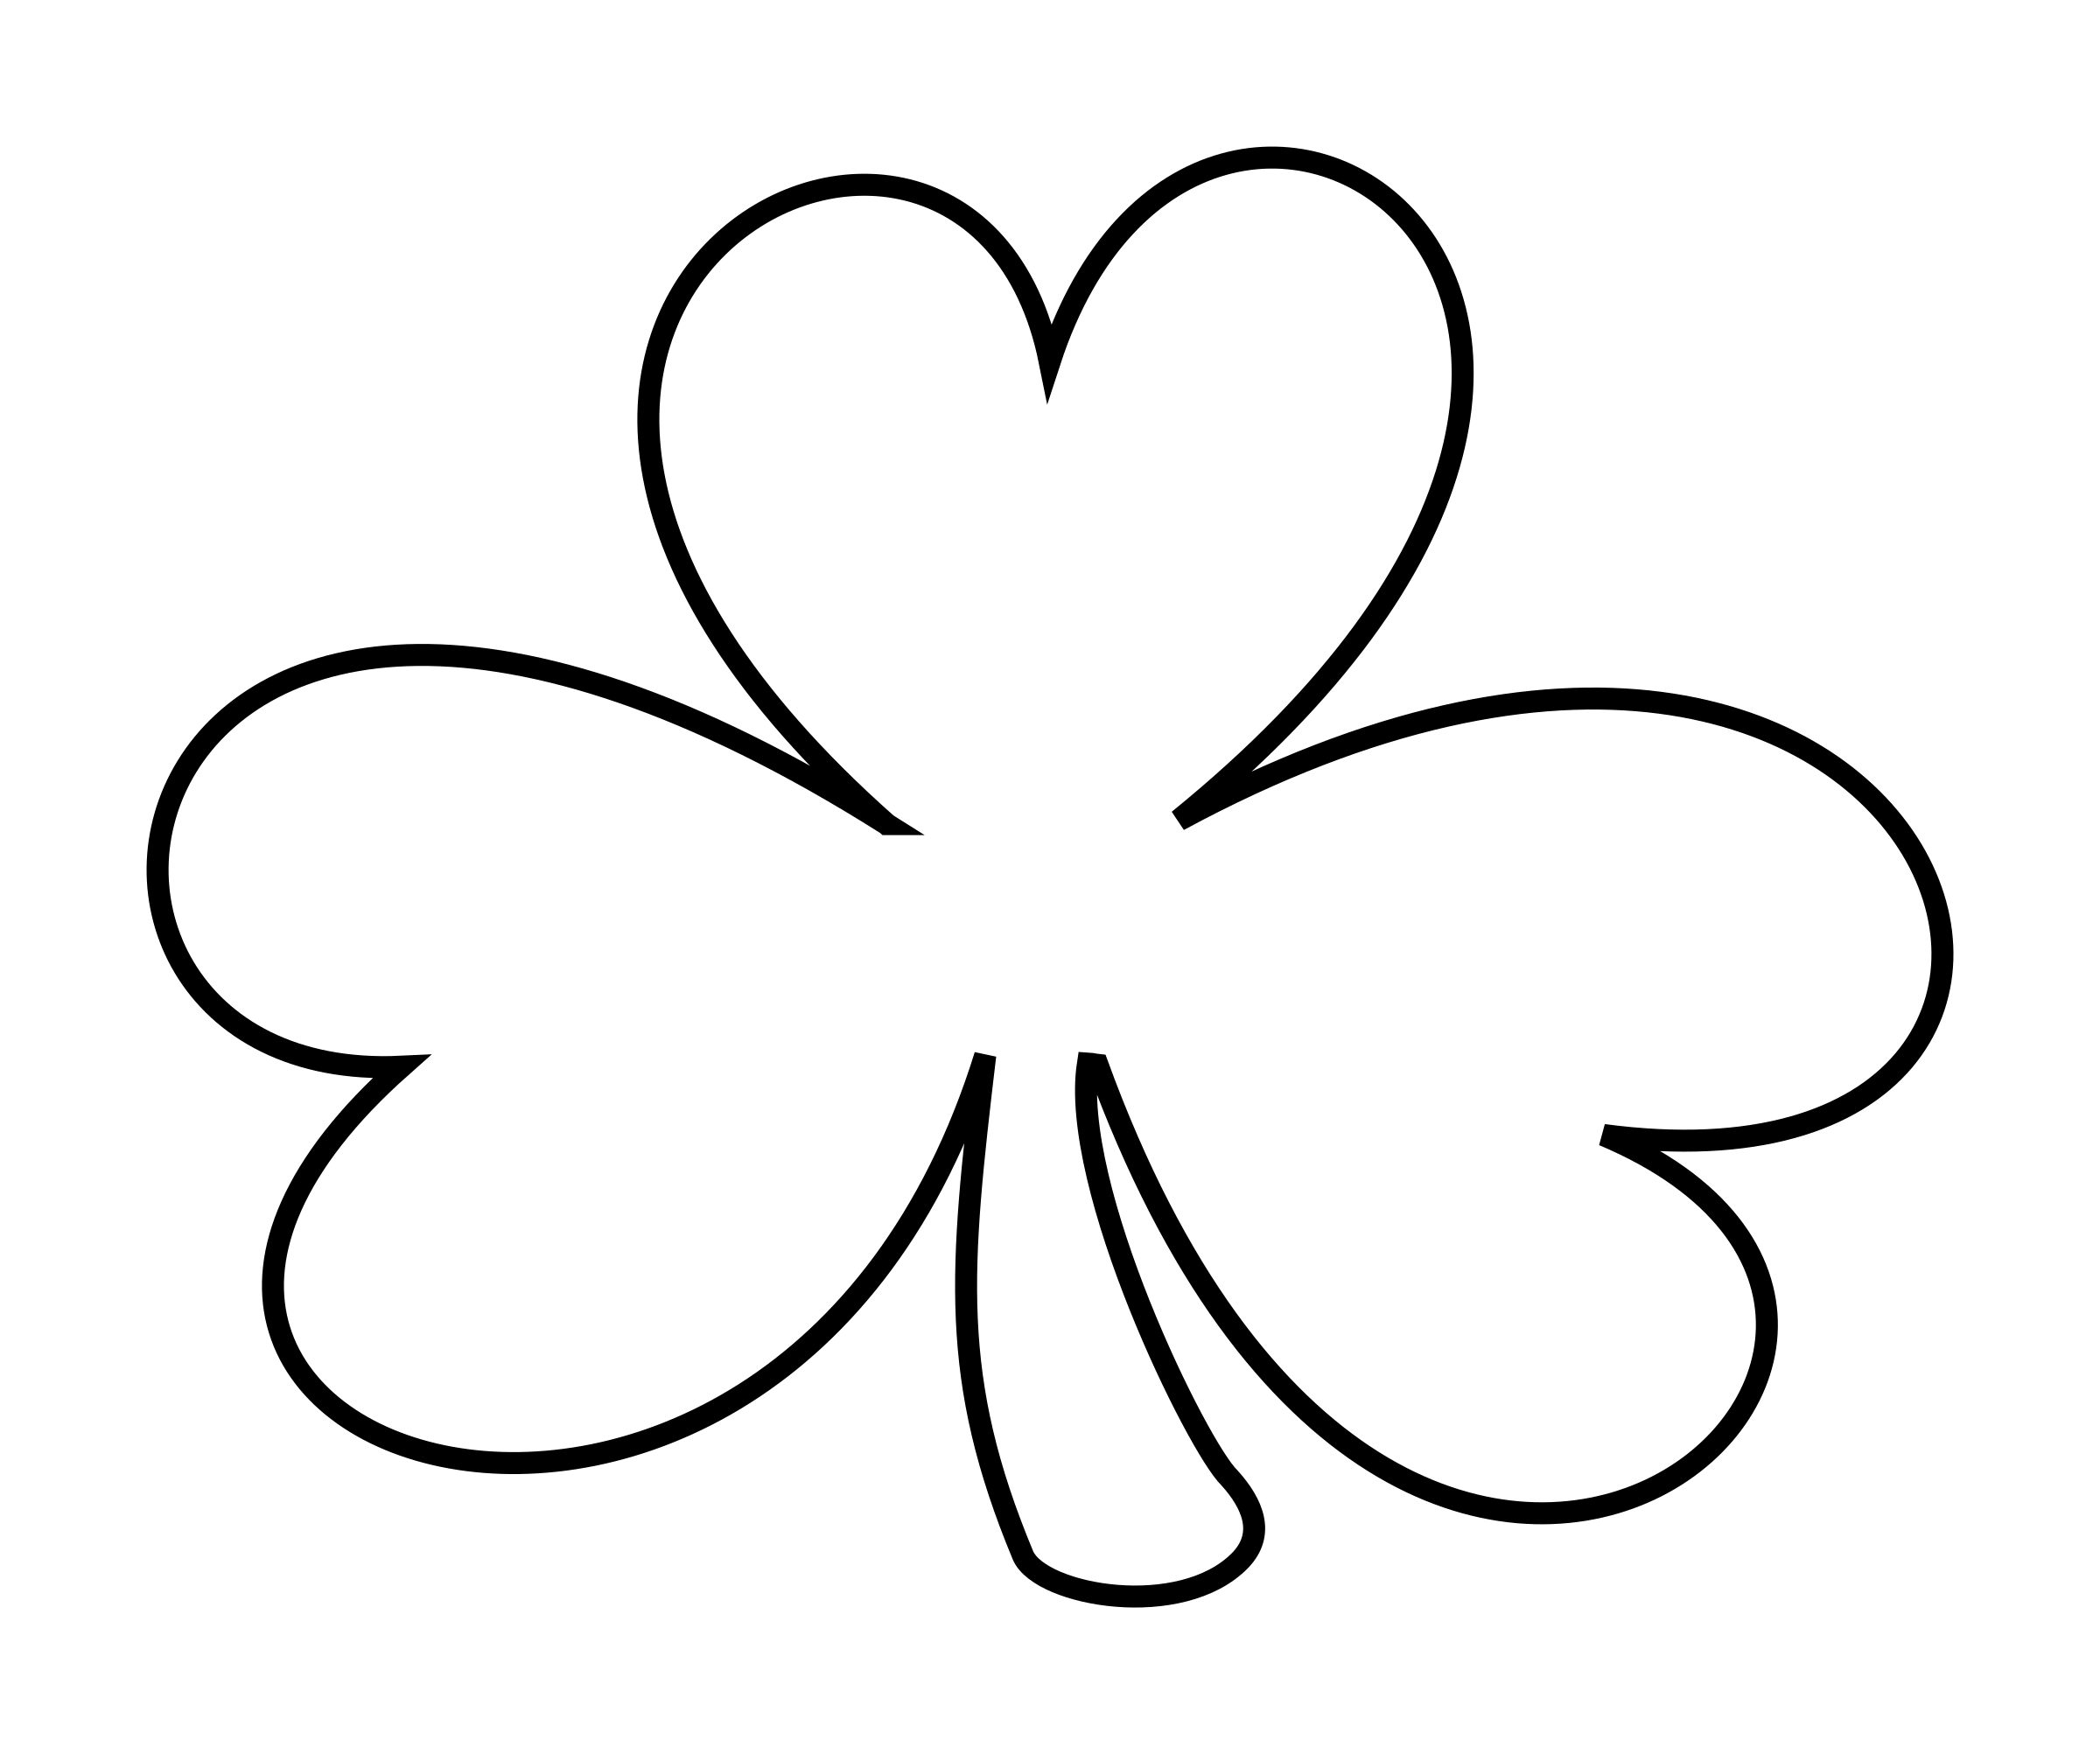 2400x2005 Shamrock Outline Clip Art